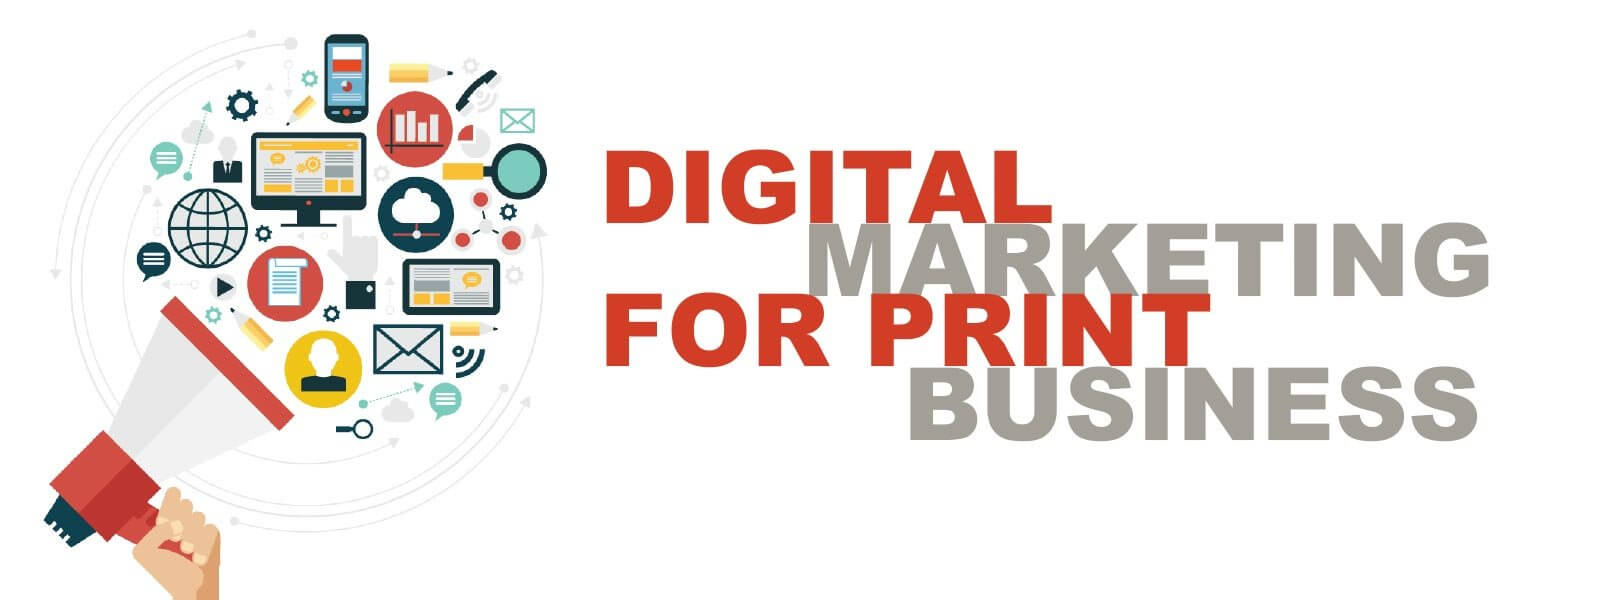 20180302_digital-marketing-01